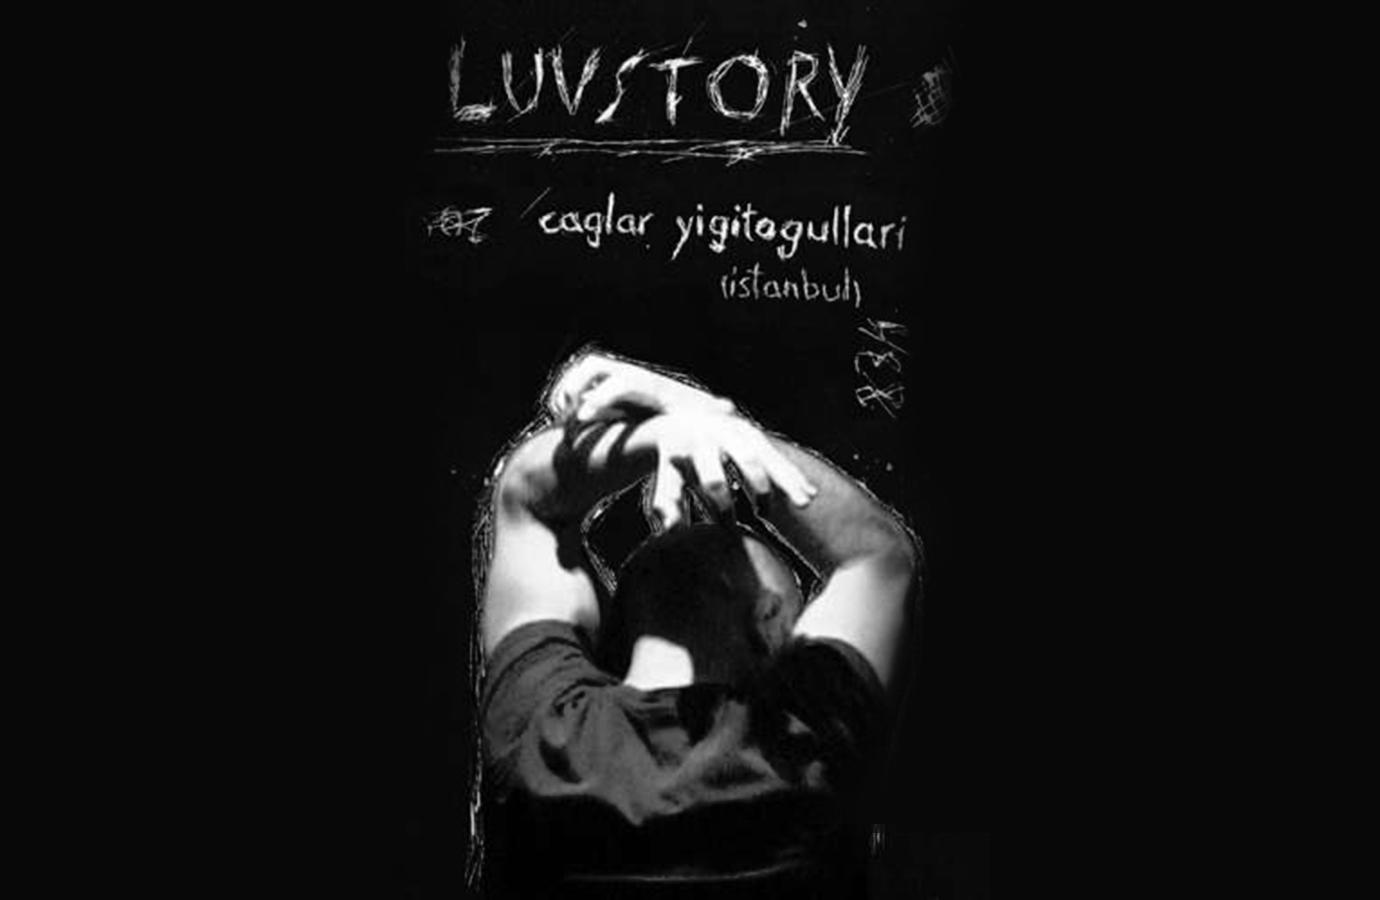 Luvstory